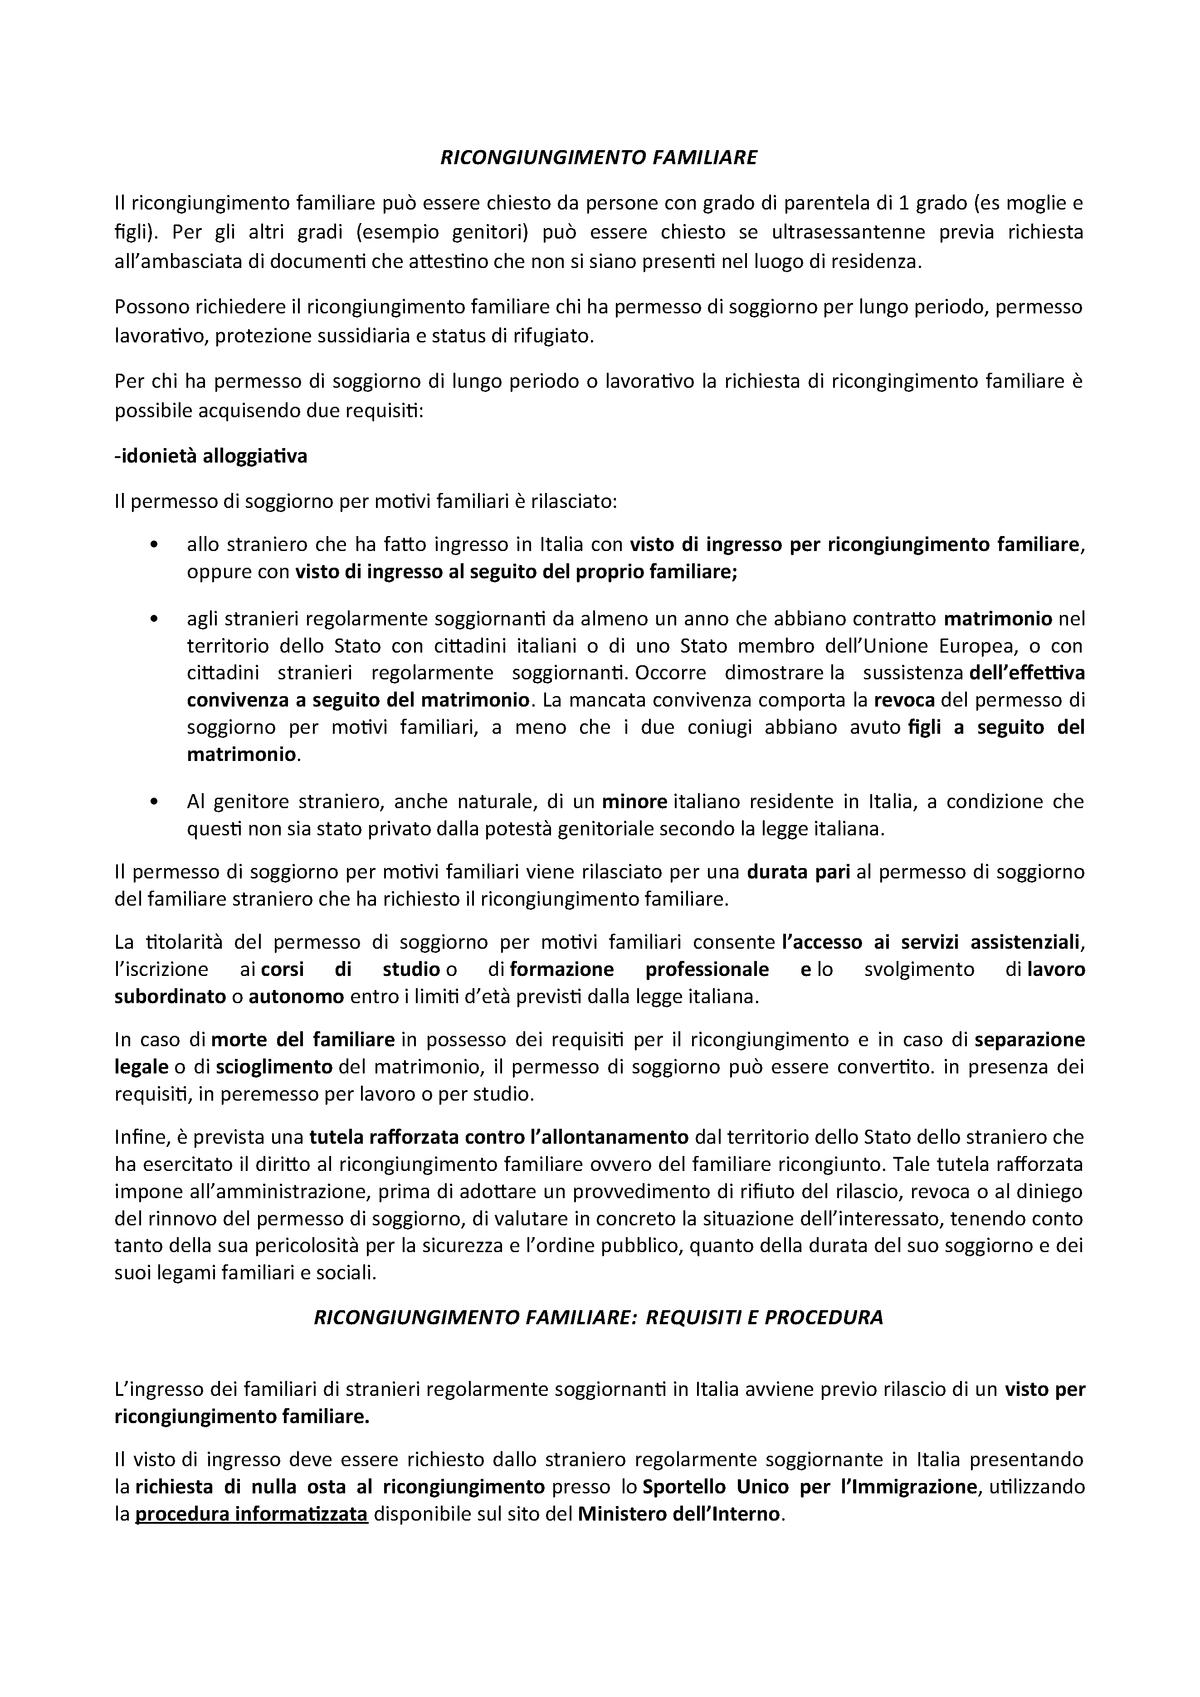 Ricongiungimento Familiare - 1042045 - uniroma1 - StuDocu